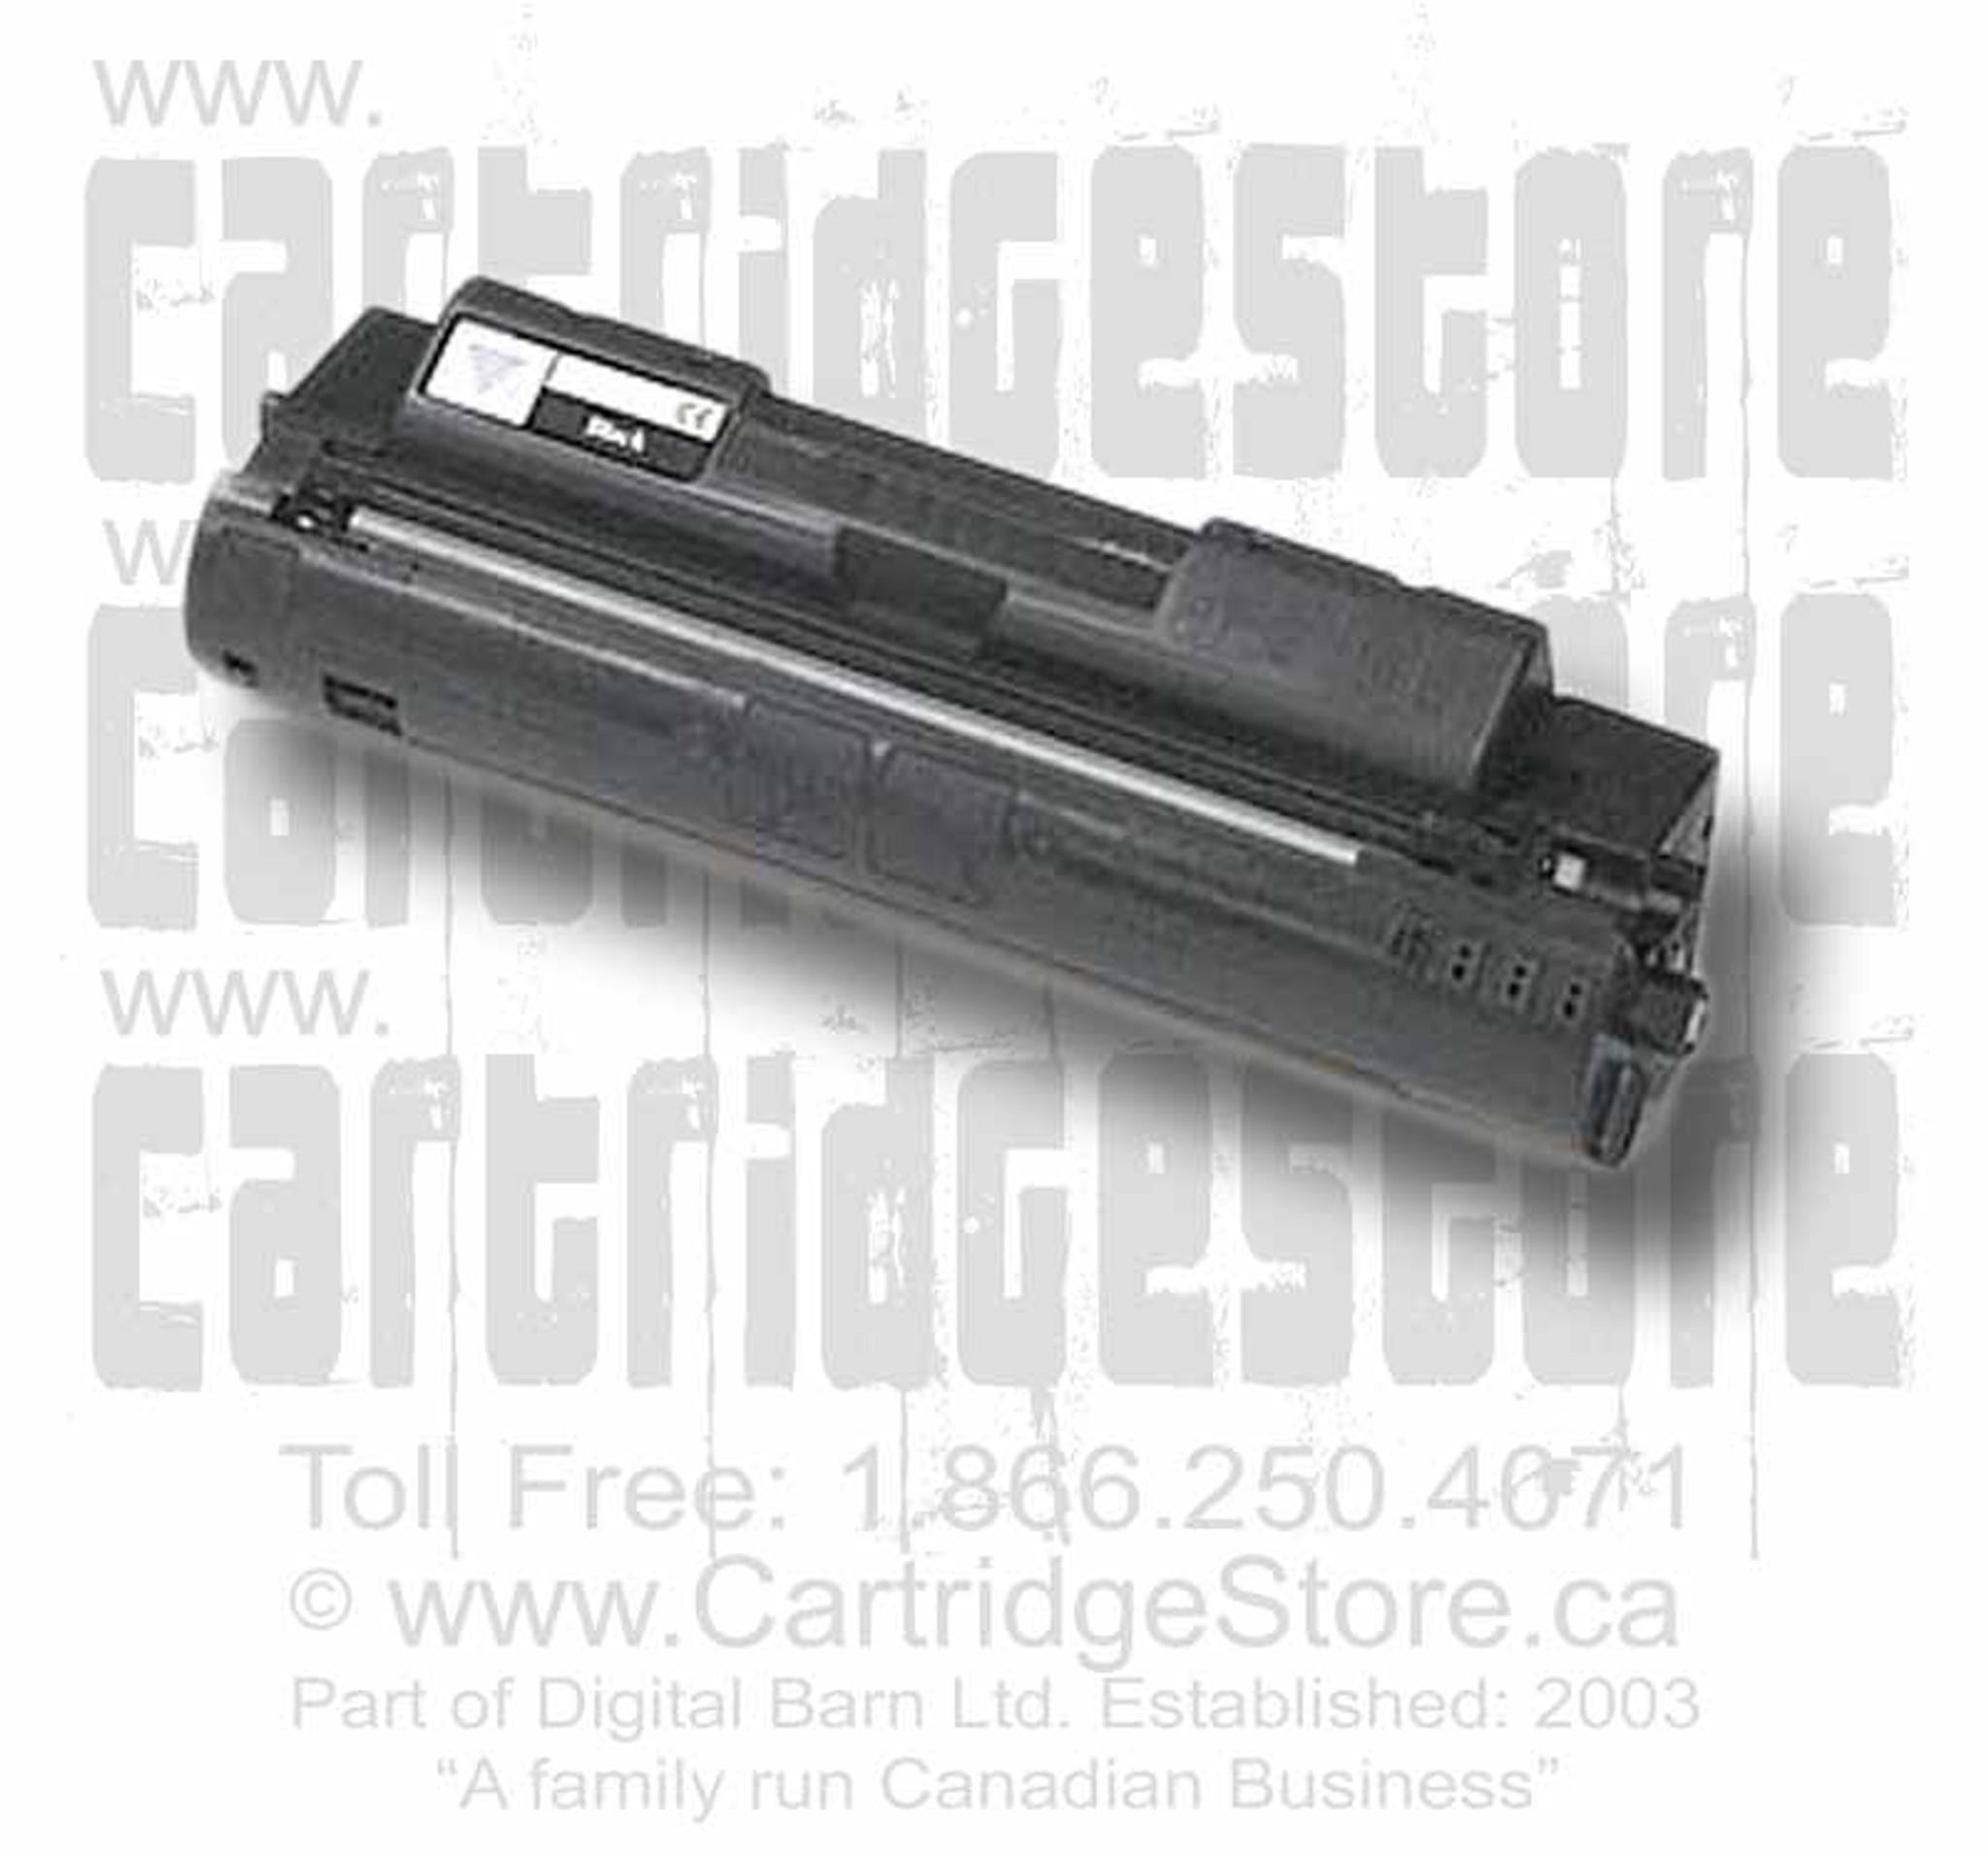 HP C4191A 91A Toner for HP Laserjet 4500, 4500DN, 4500N, 4550, 4550N,  4550DN, 4550HDN Printers